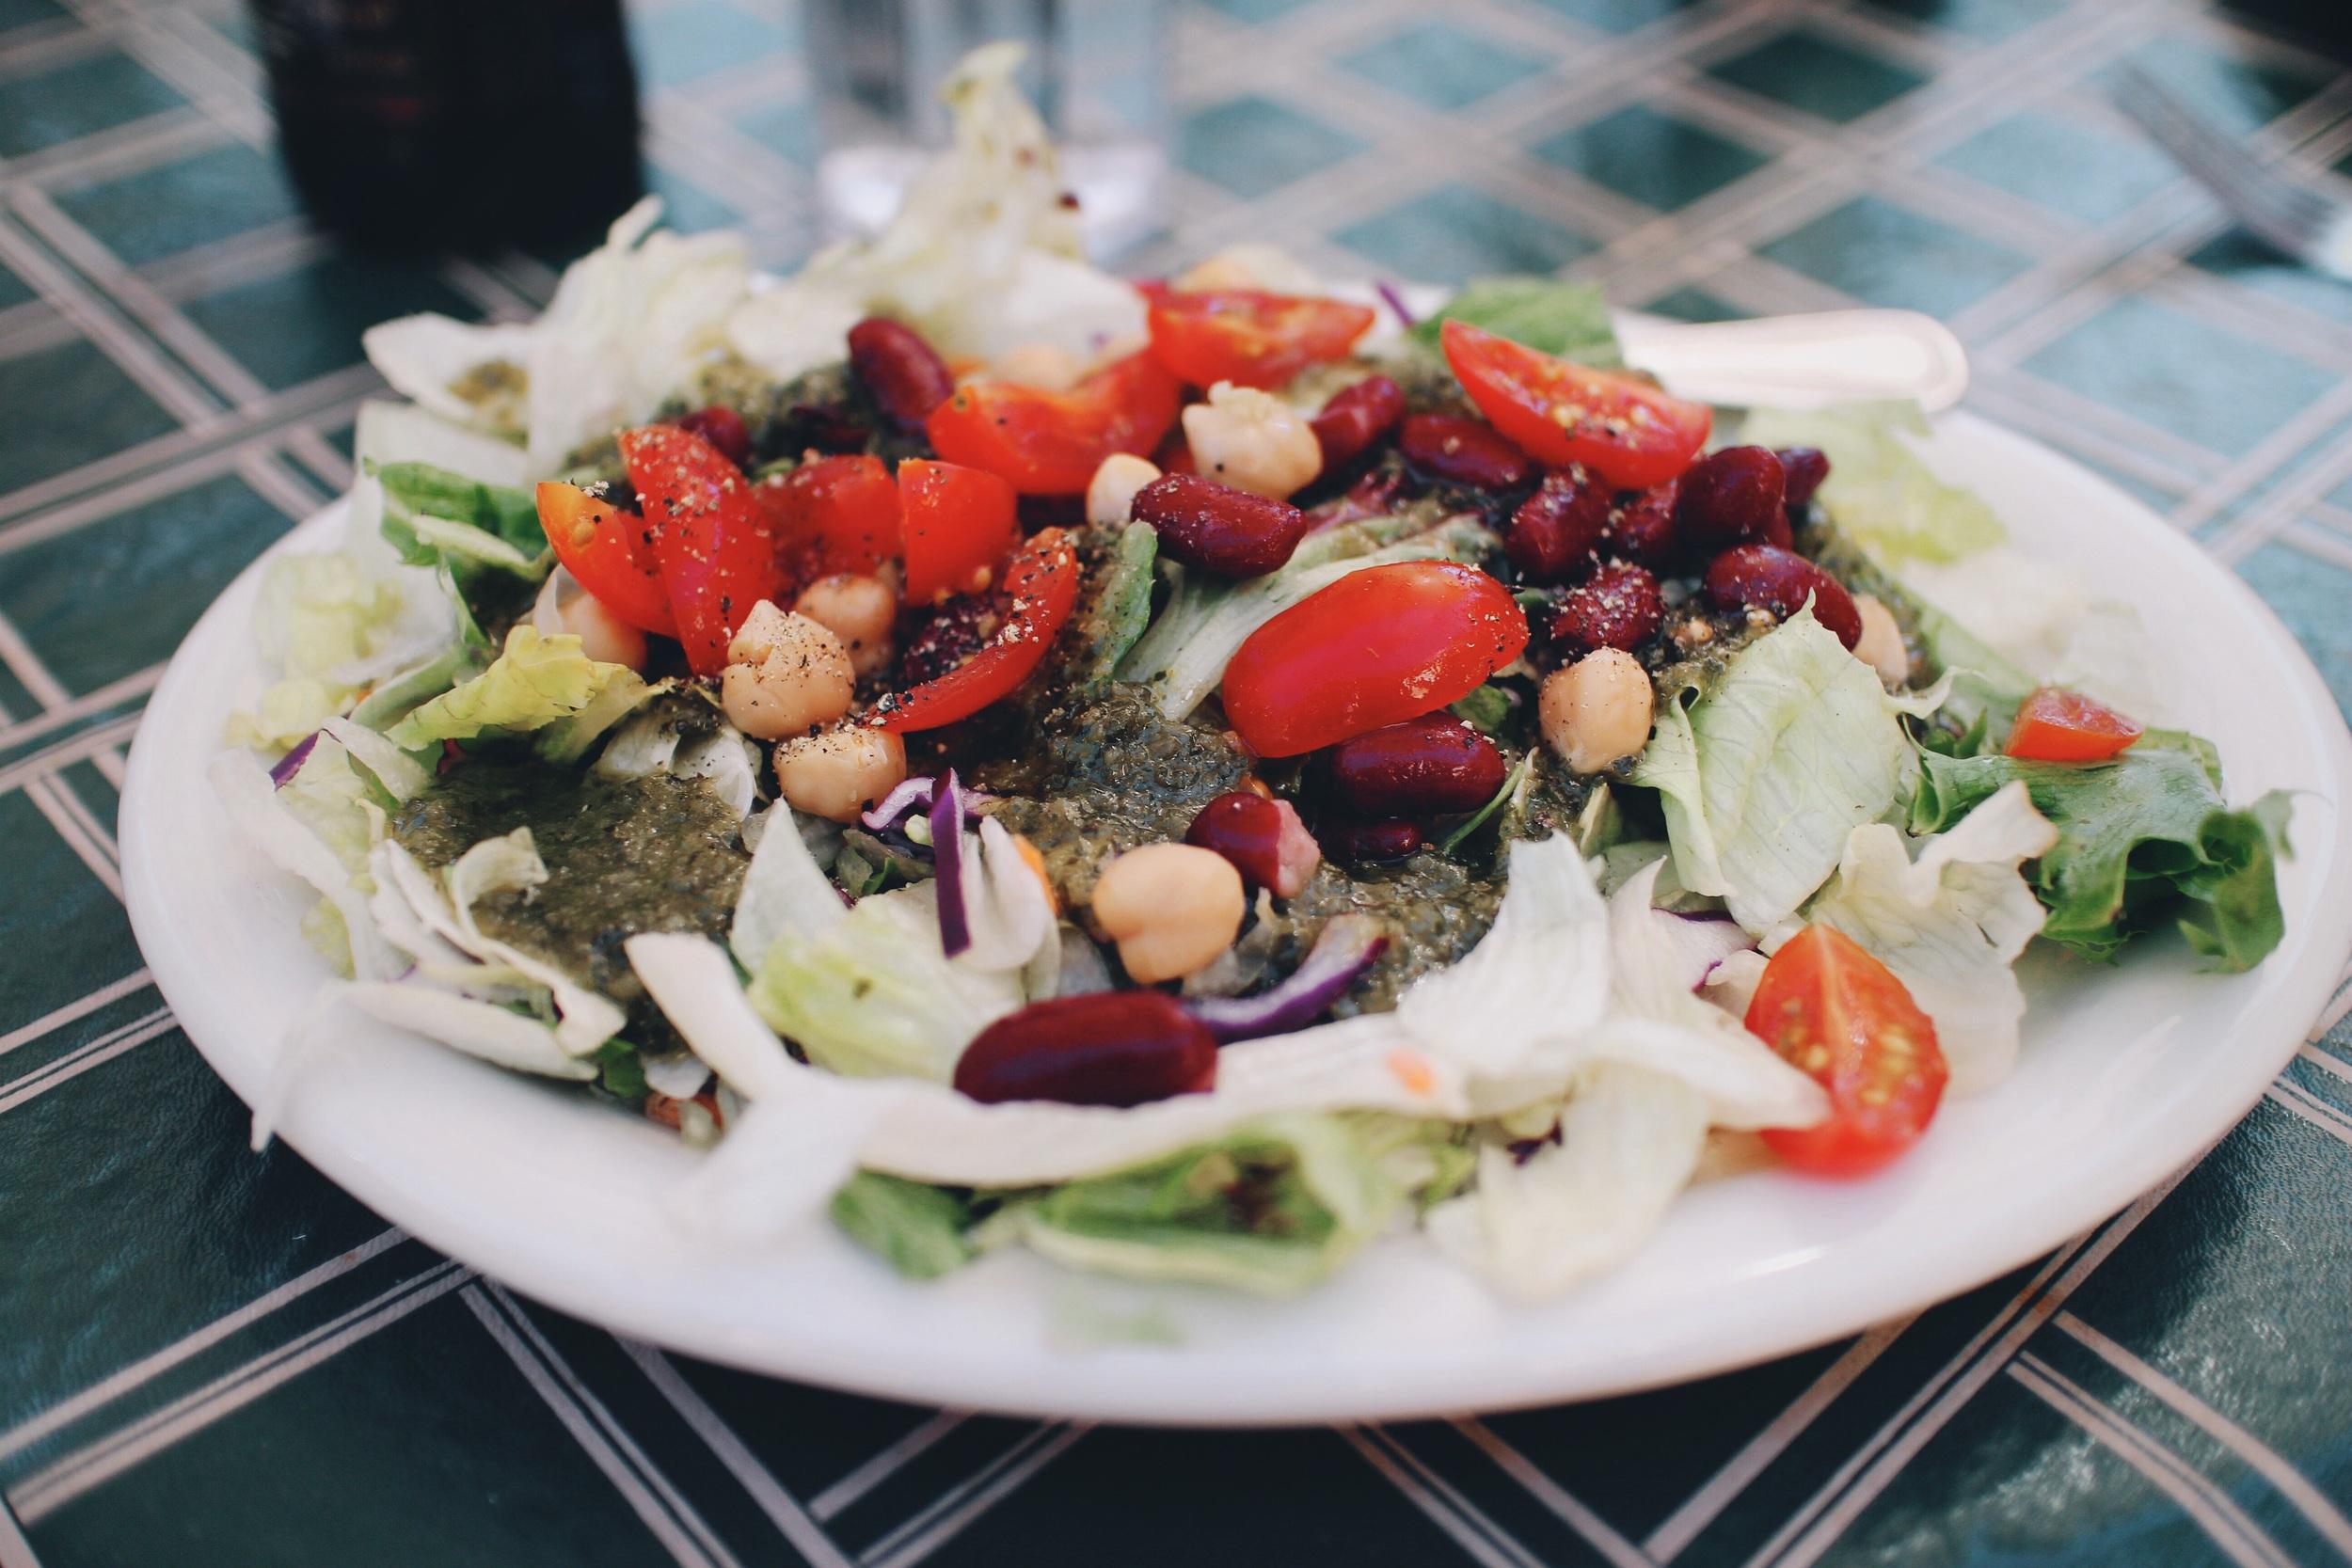 My salad with basil vinegarette.